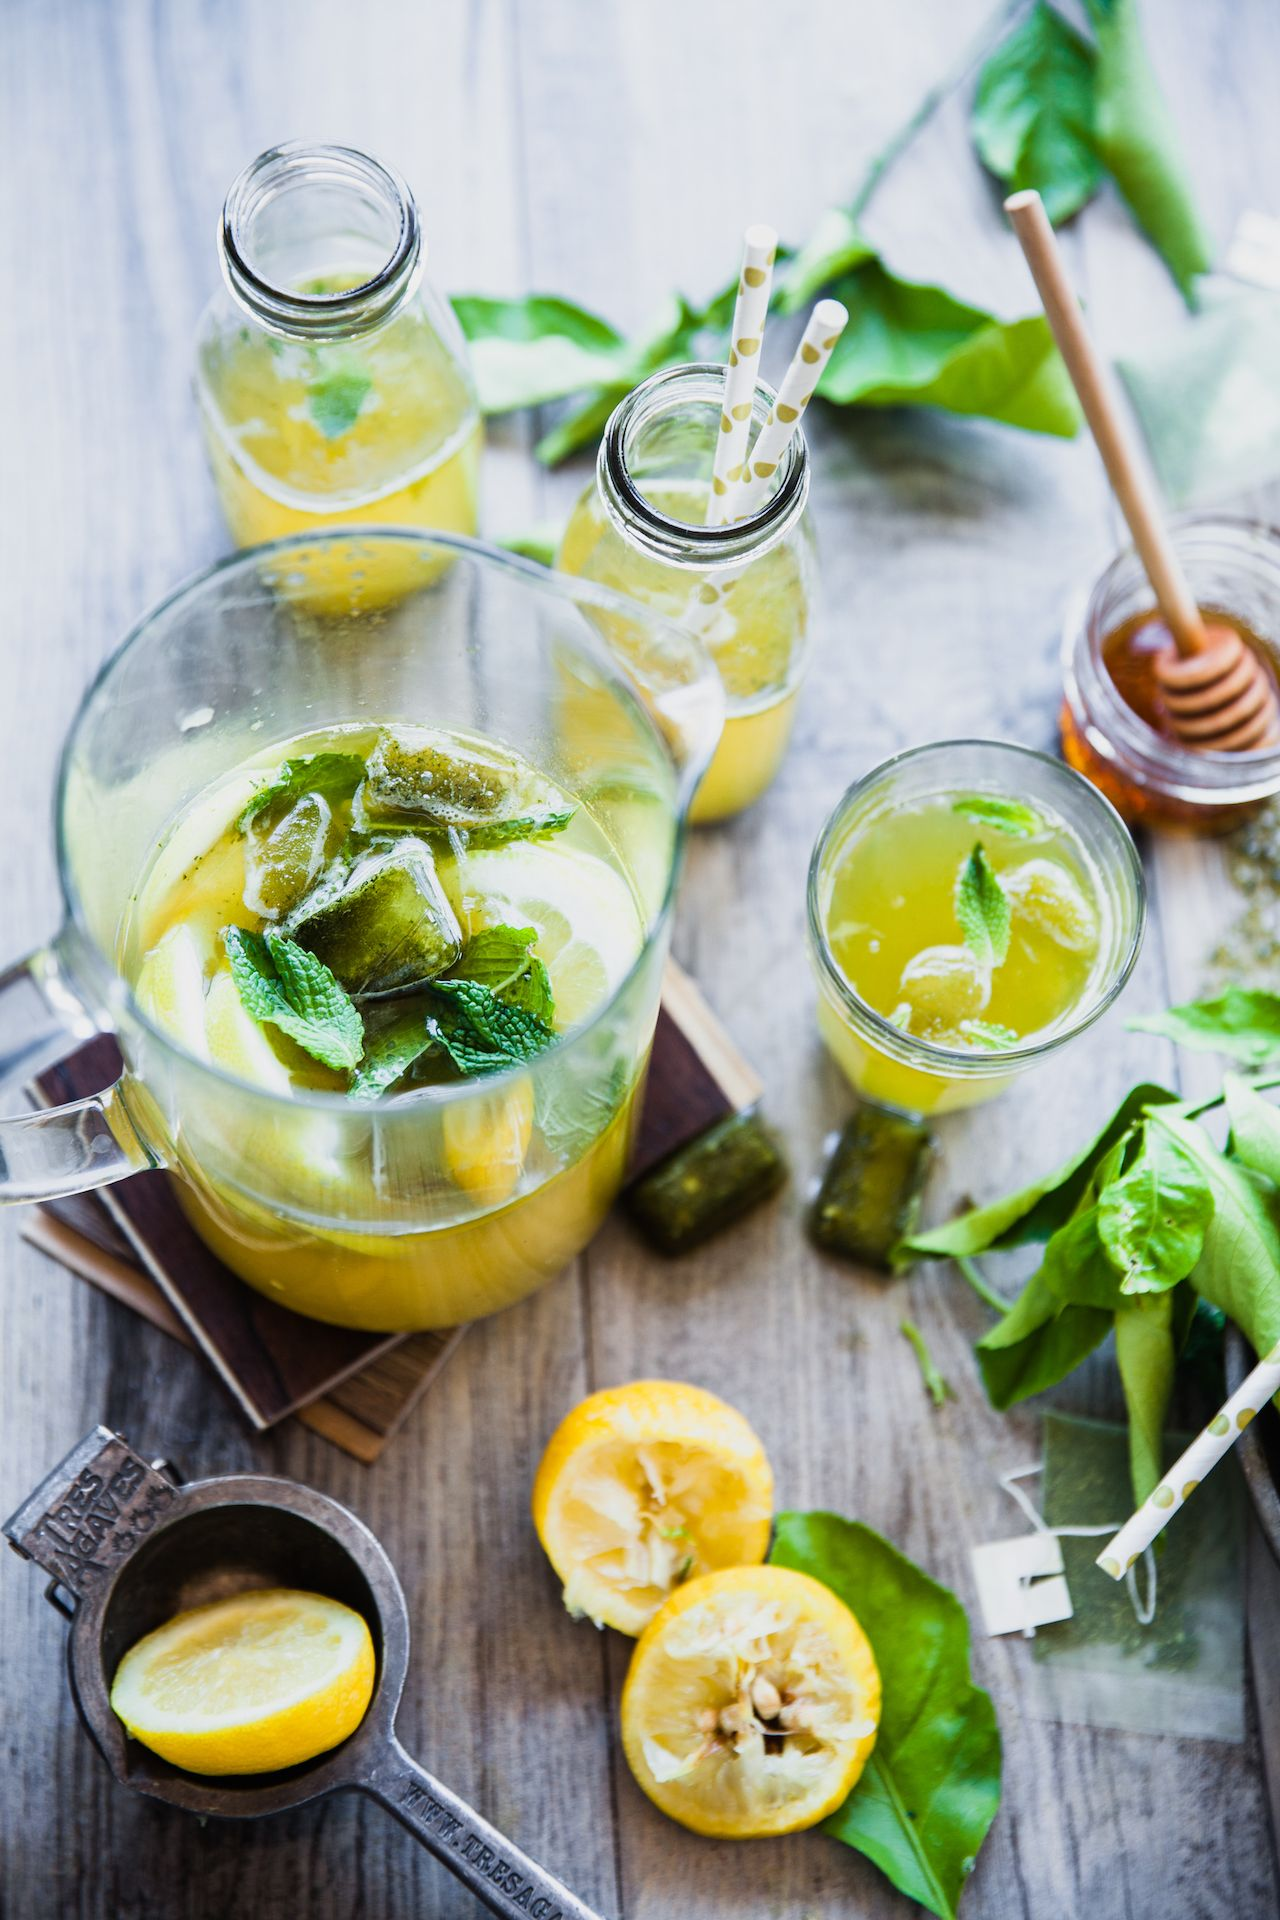 Green Tea Mint Lemonade